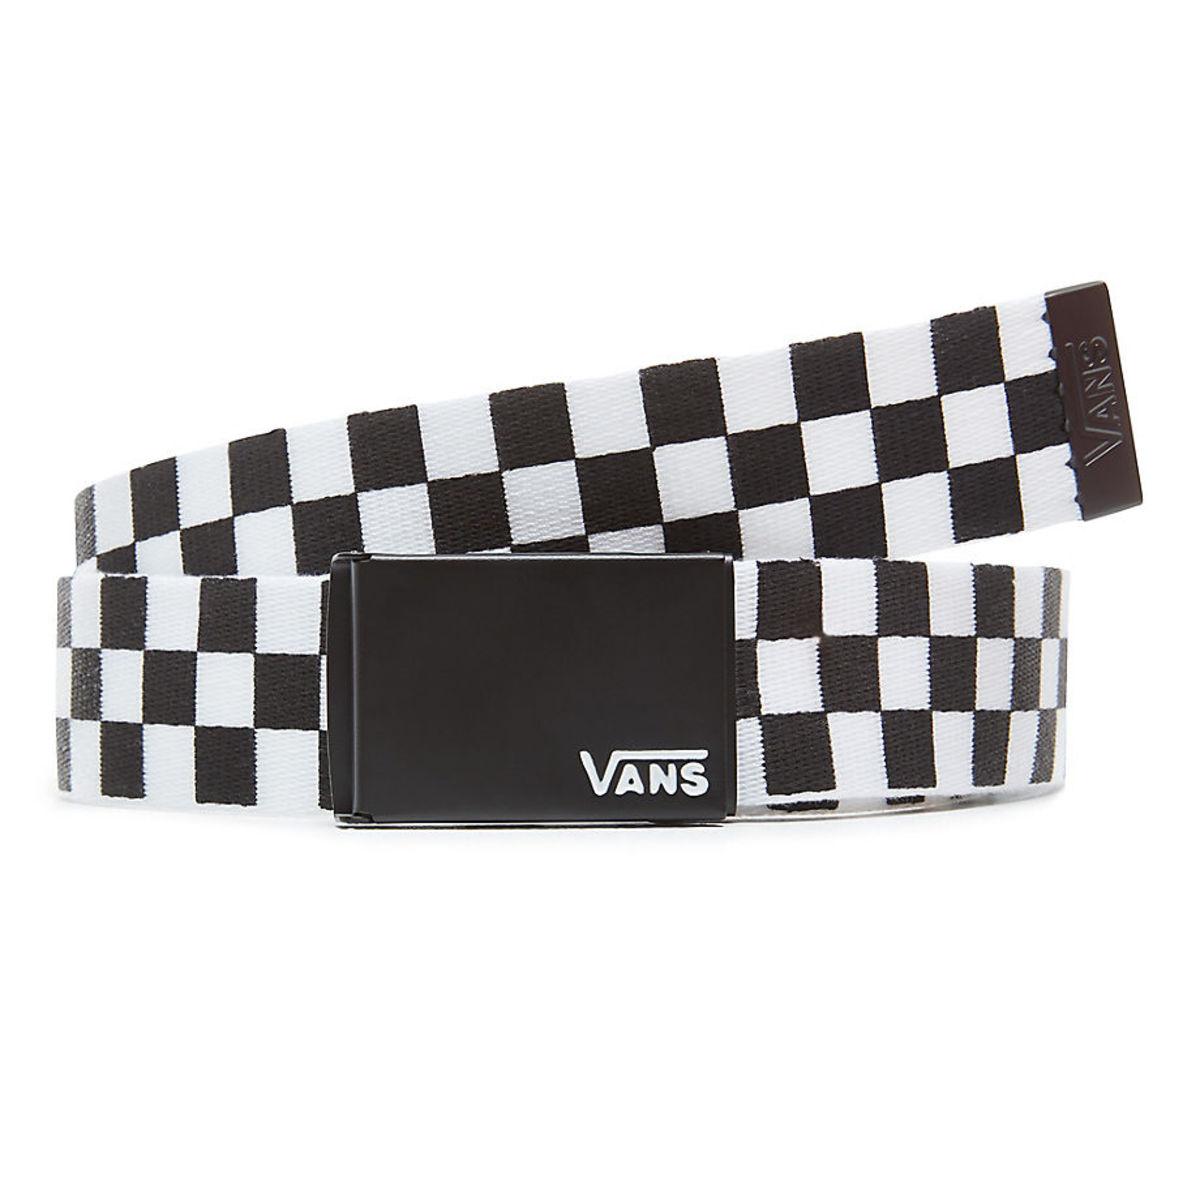 opasok VANS - MN DEPPSTER II WEB B - Black/White - VA31J1Y28